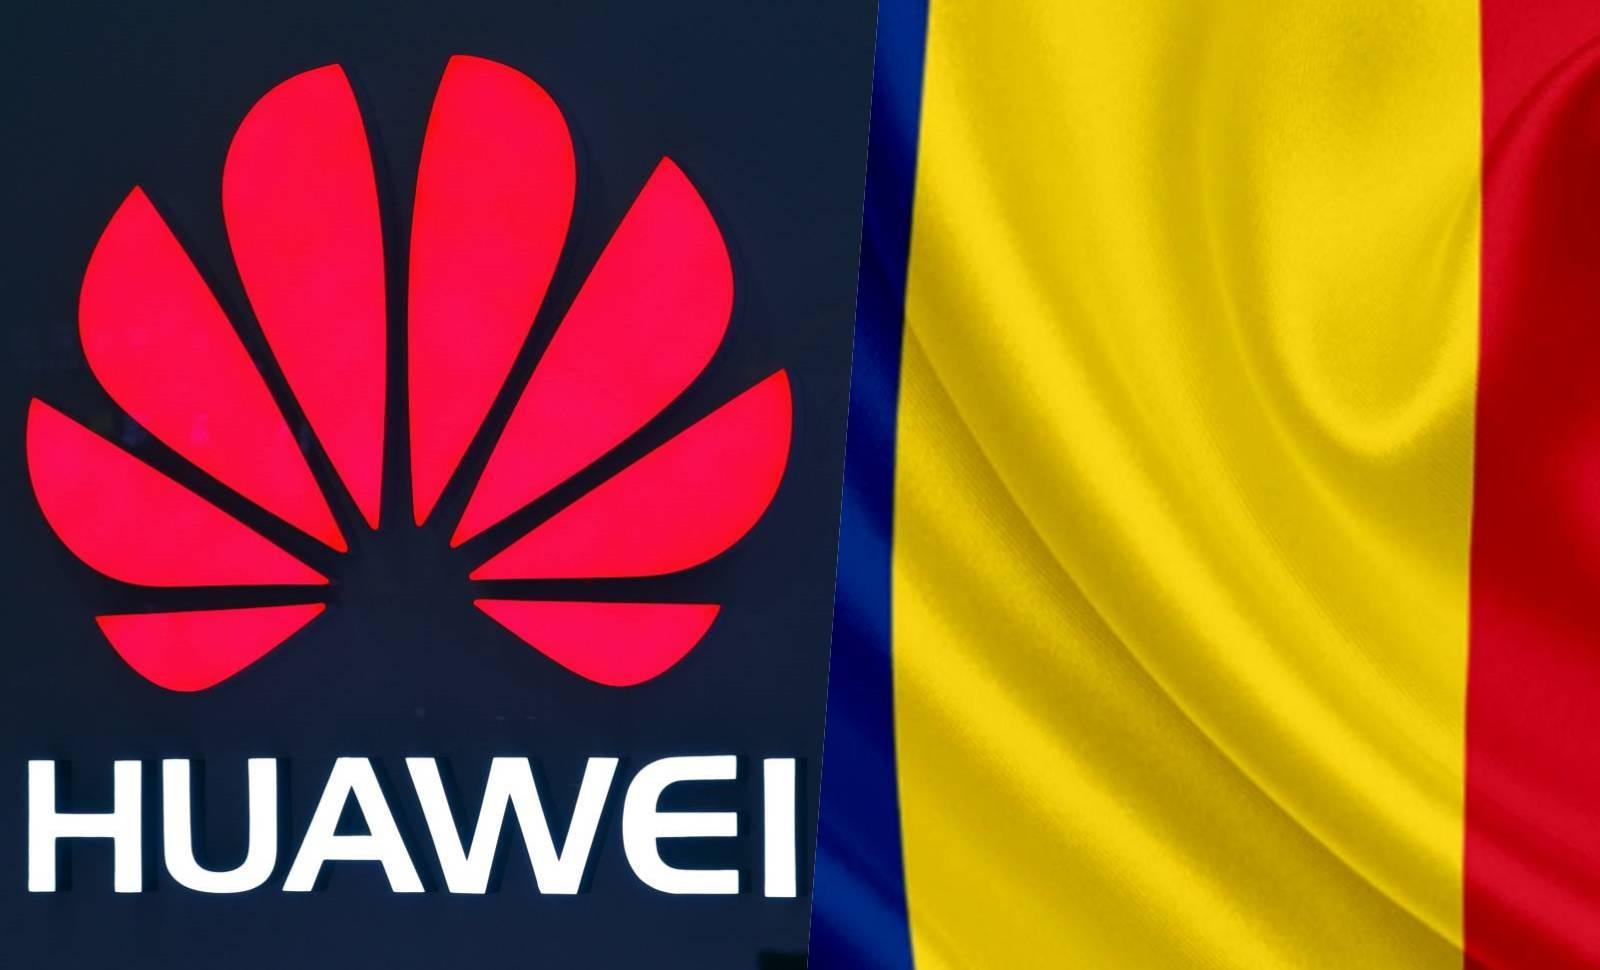 Huawei situatie romania 2020